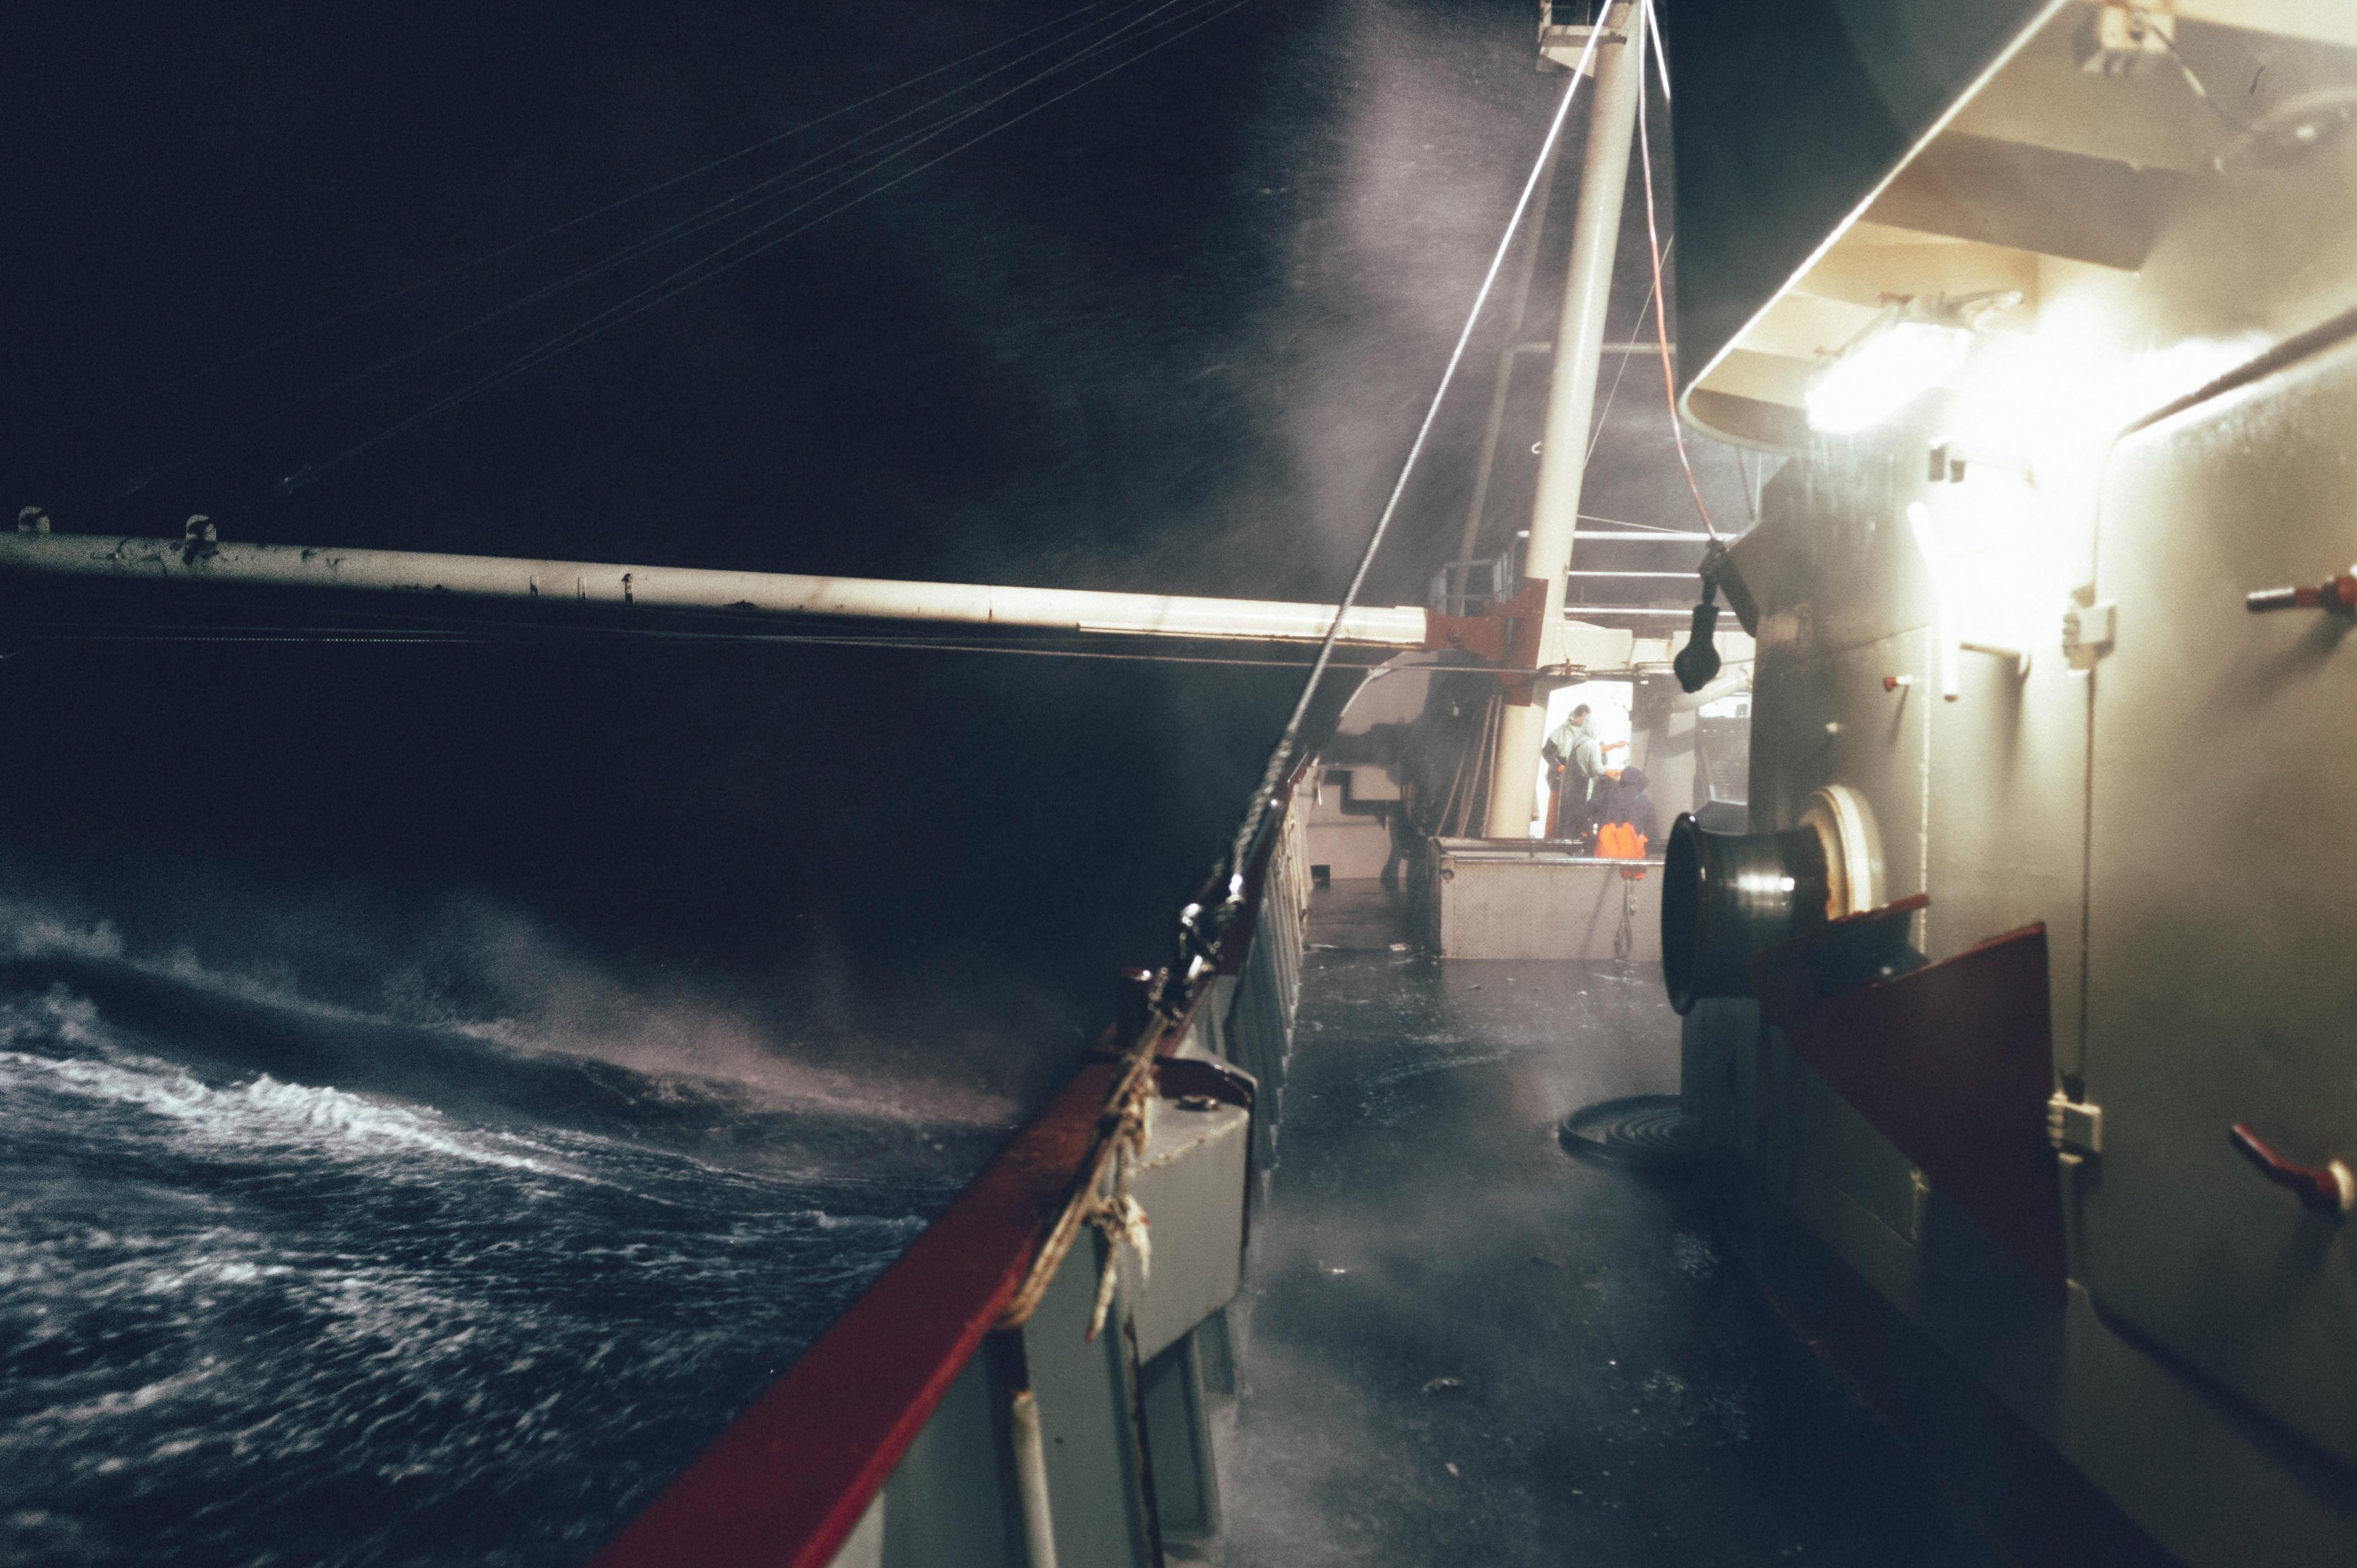 <p>&nbsp;&bdquo;Непознатият Север&ldquo; &ndash;&nbsp;проект на Ивайло&nbsp;в Северно море.</p>